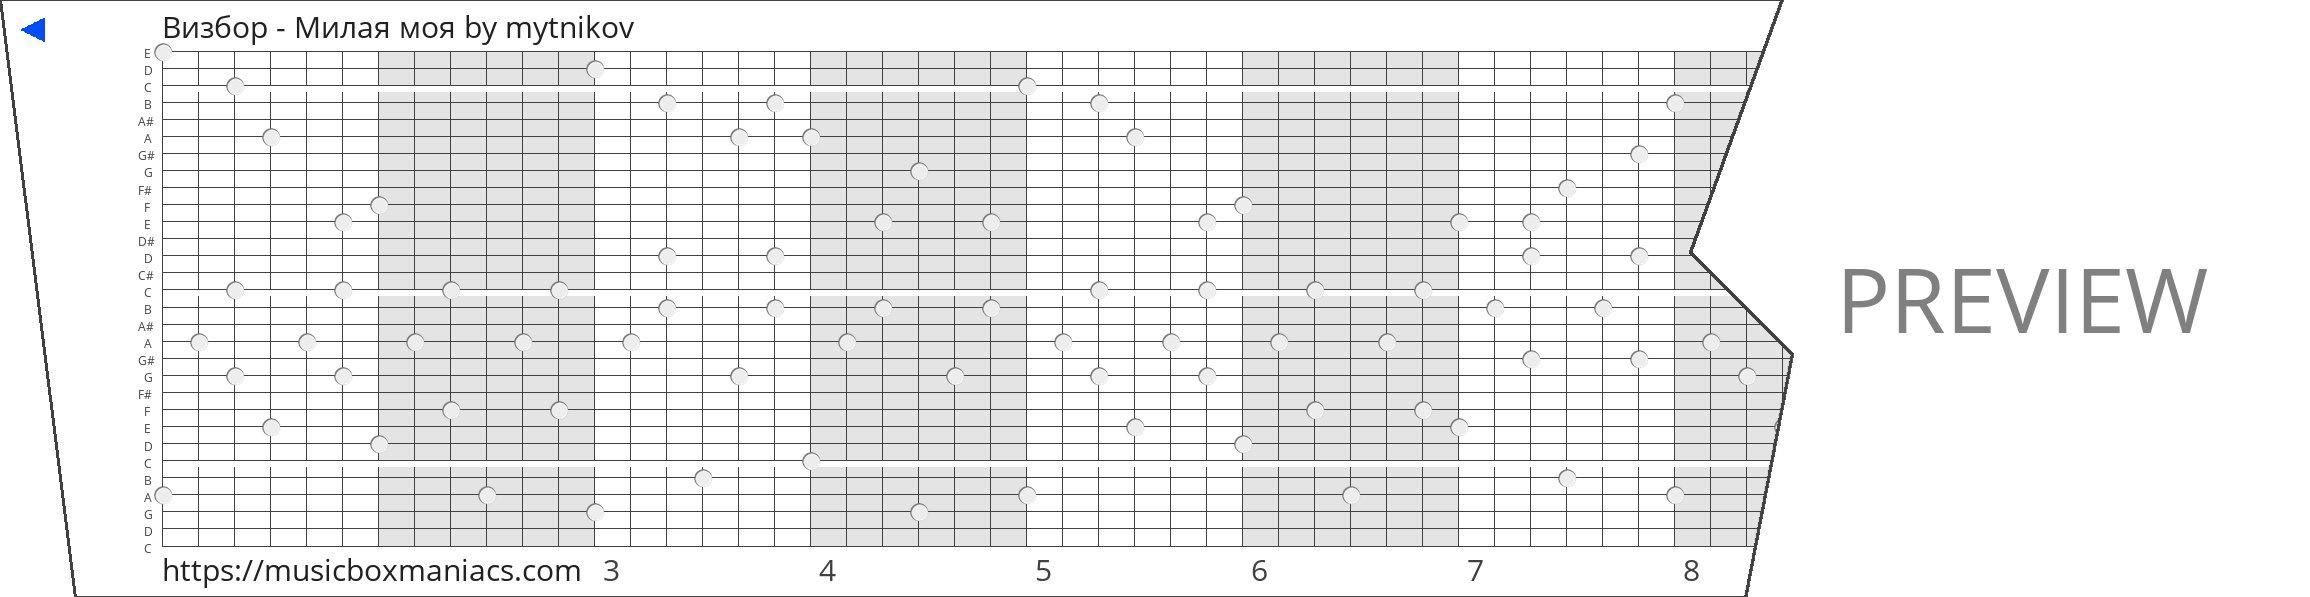 Визбор - Милая моя 30 note music box paper strip